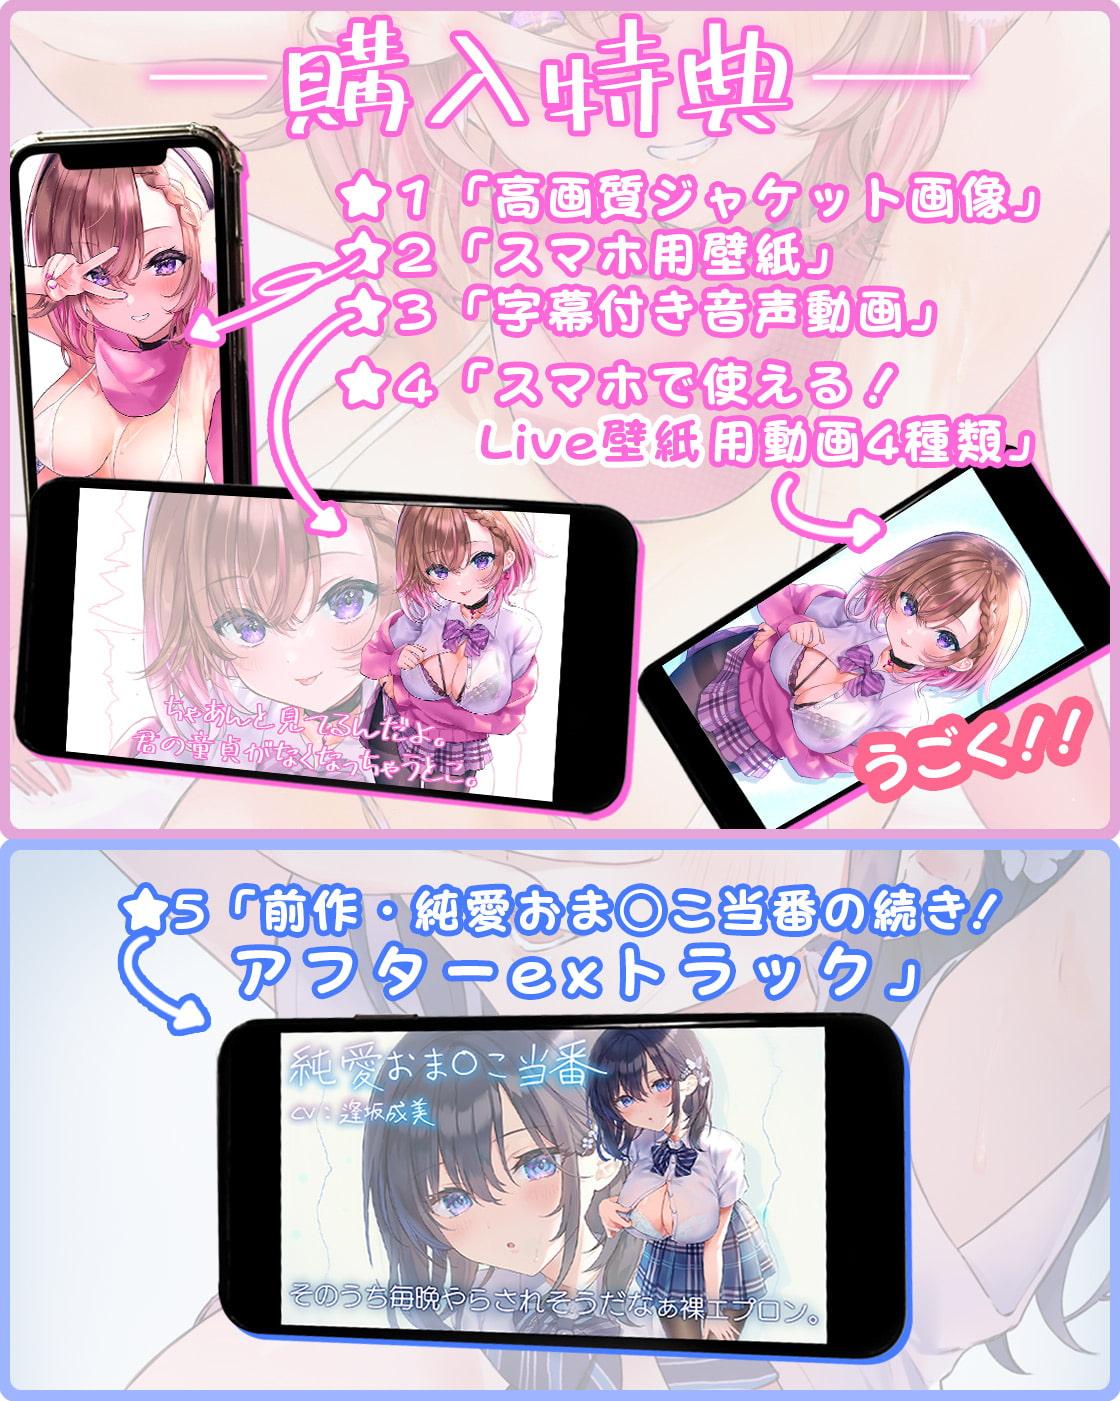 [RJ308835]純情おま○こ当番【フォーリーサウンド】[OD/度盘] (5.61GB) 4